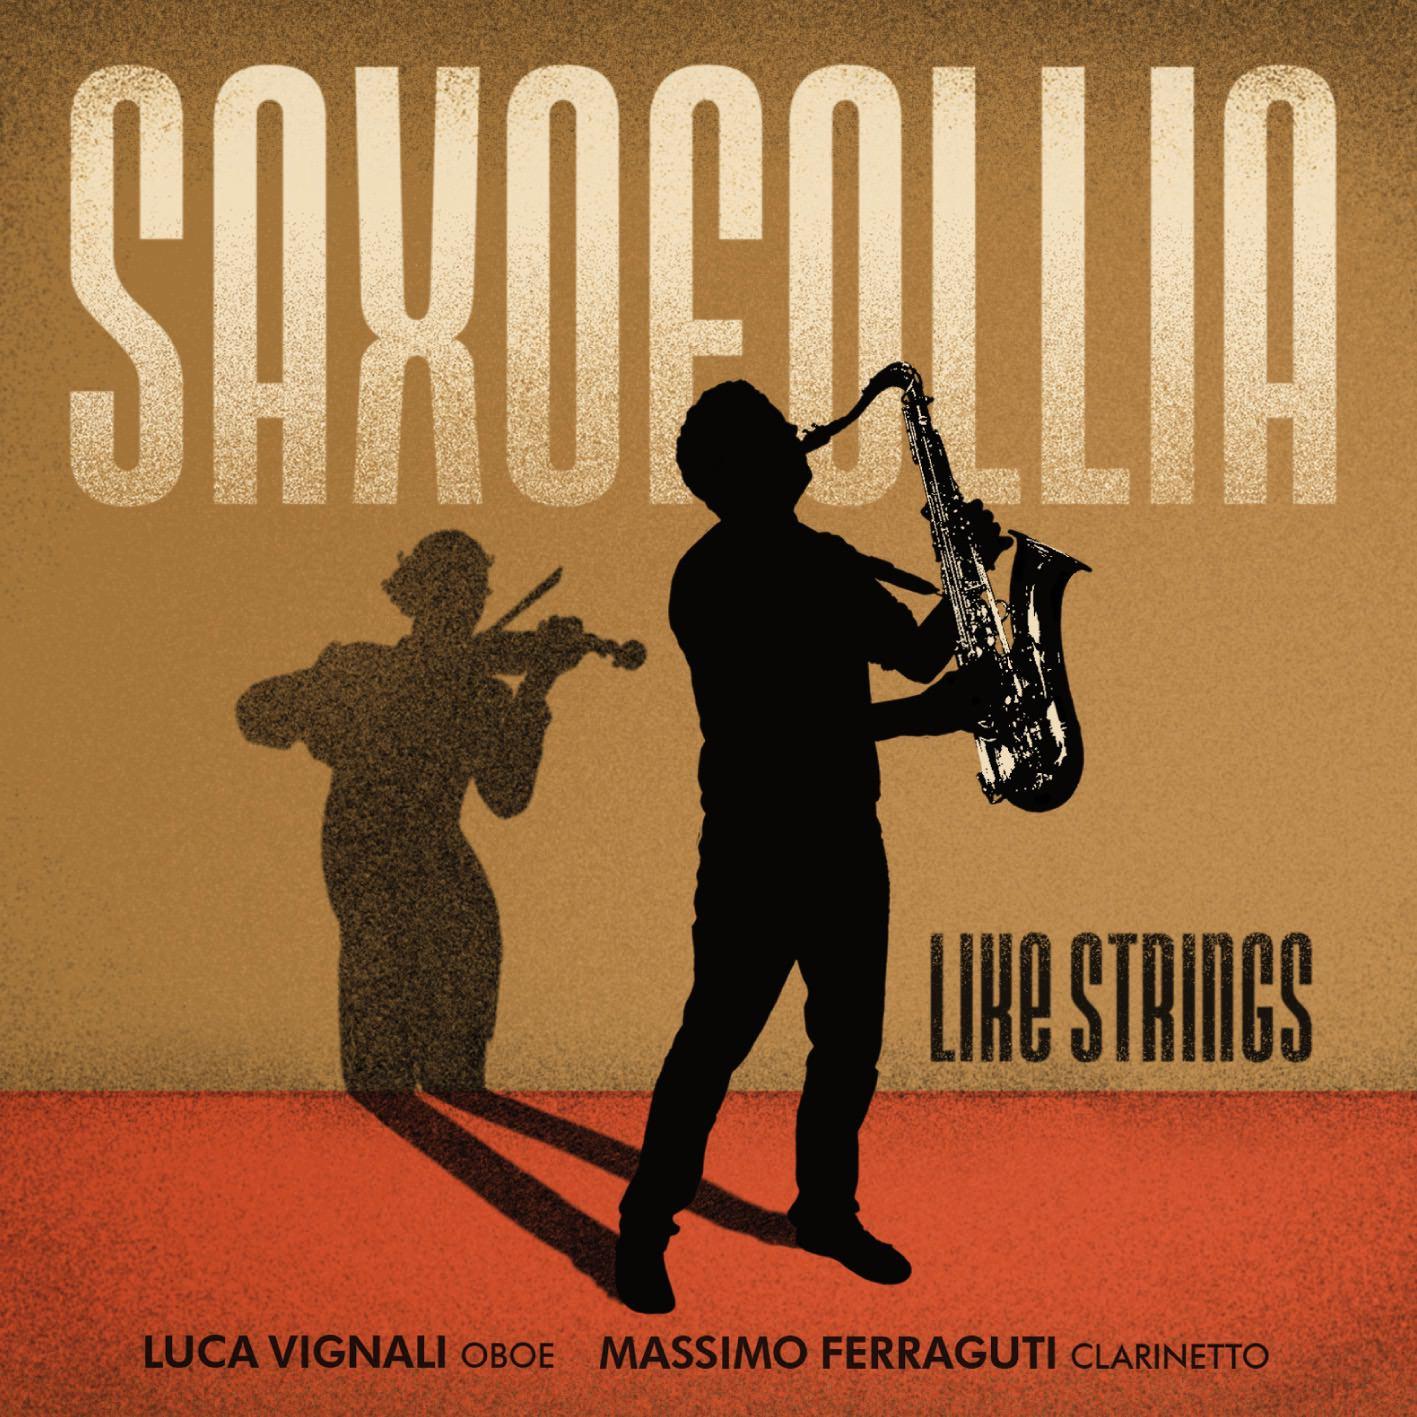 DEFINITIVO - CD Like Strings